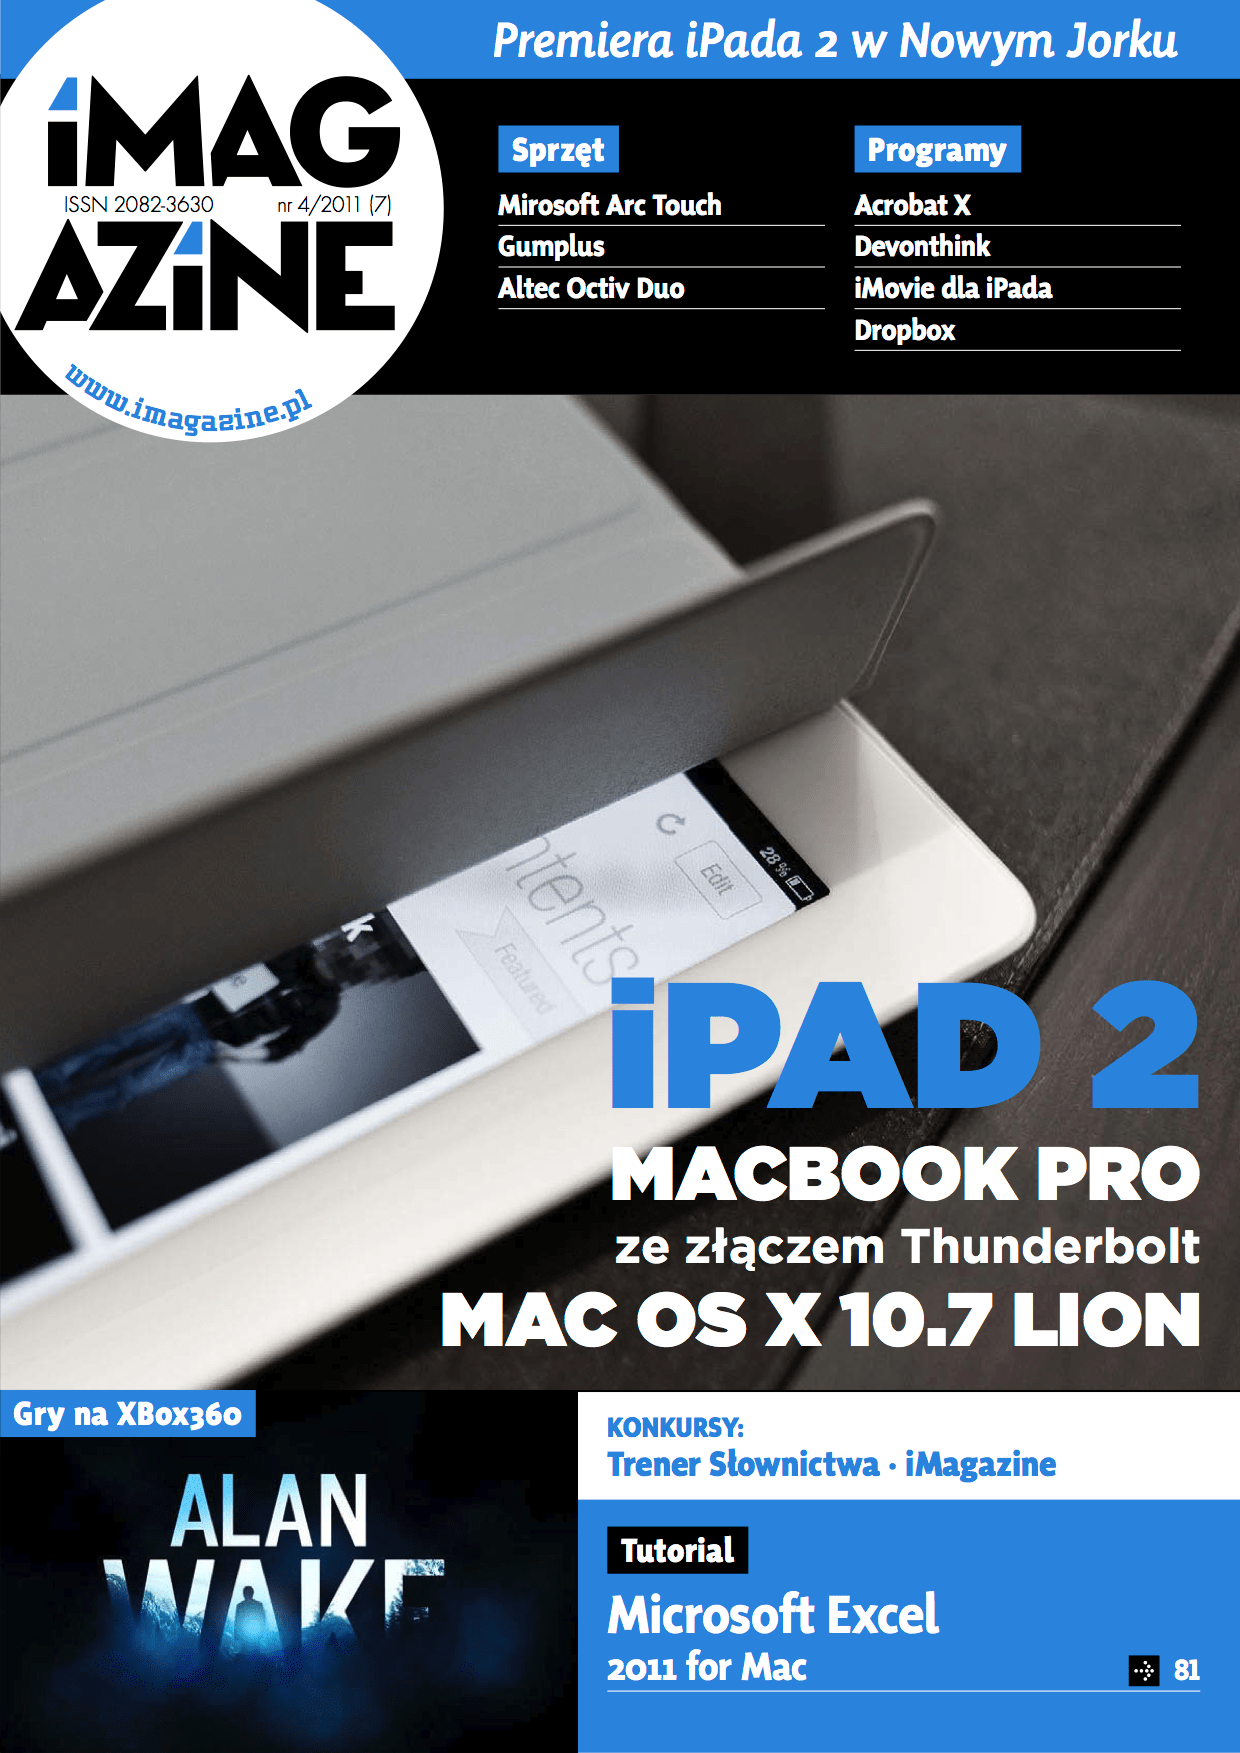 iMagazine 4/2011 – iPad 2, Macbook Pro, OSX 10.7 Lion